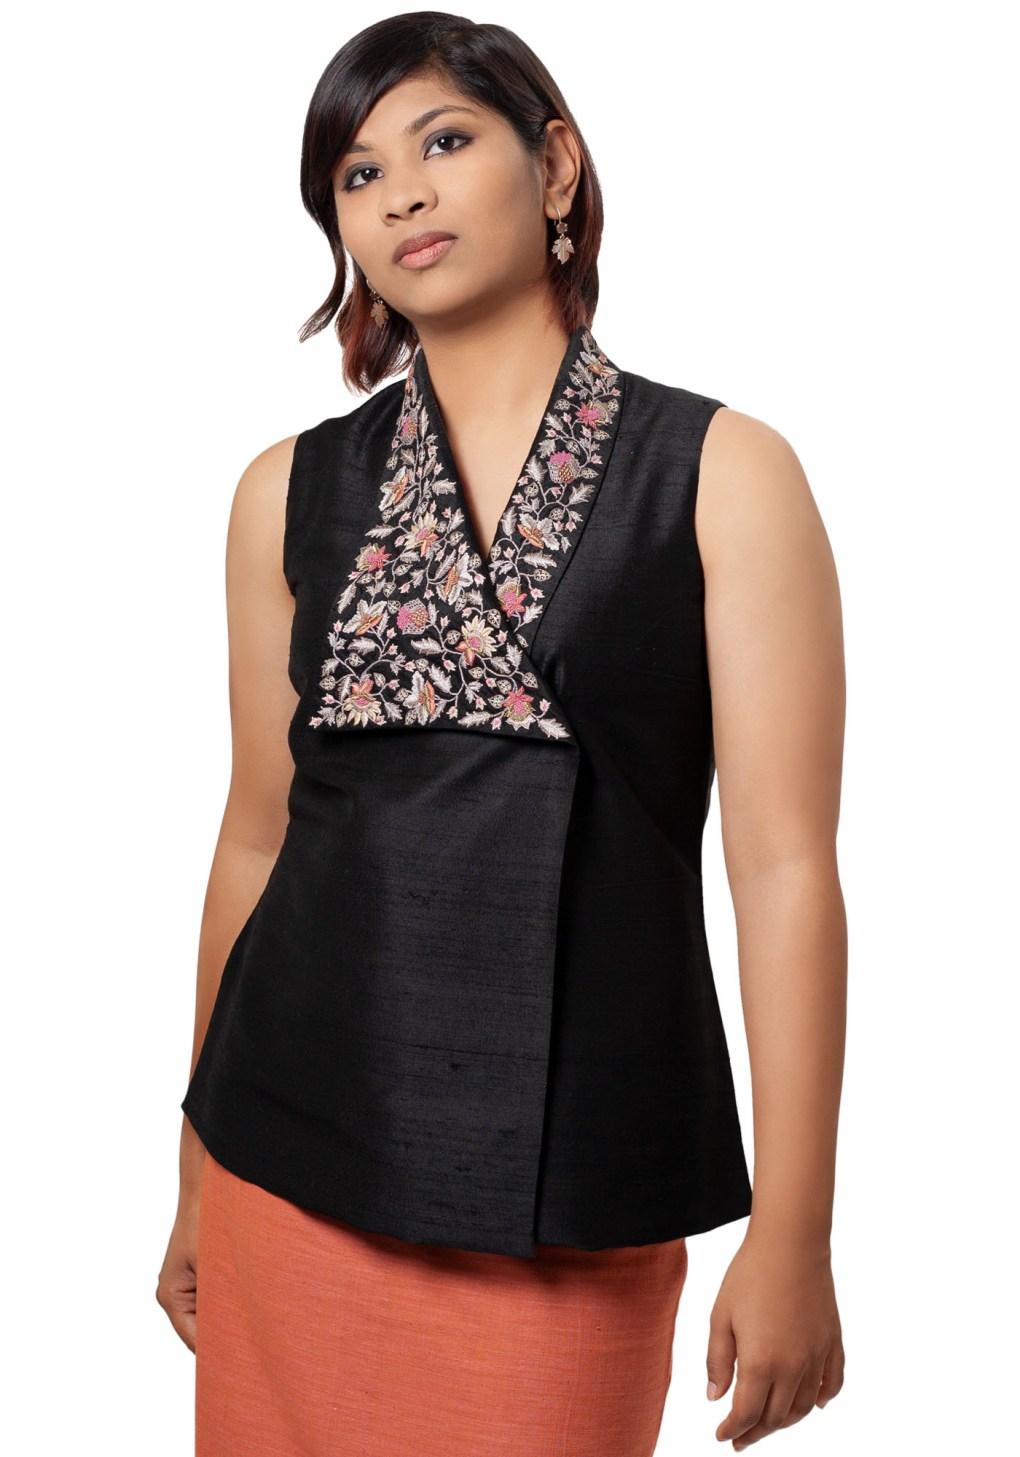 Elegant Asymmetric Hand Embroidered Top in Black Silk